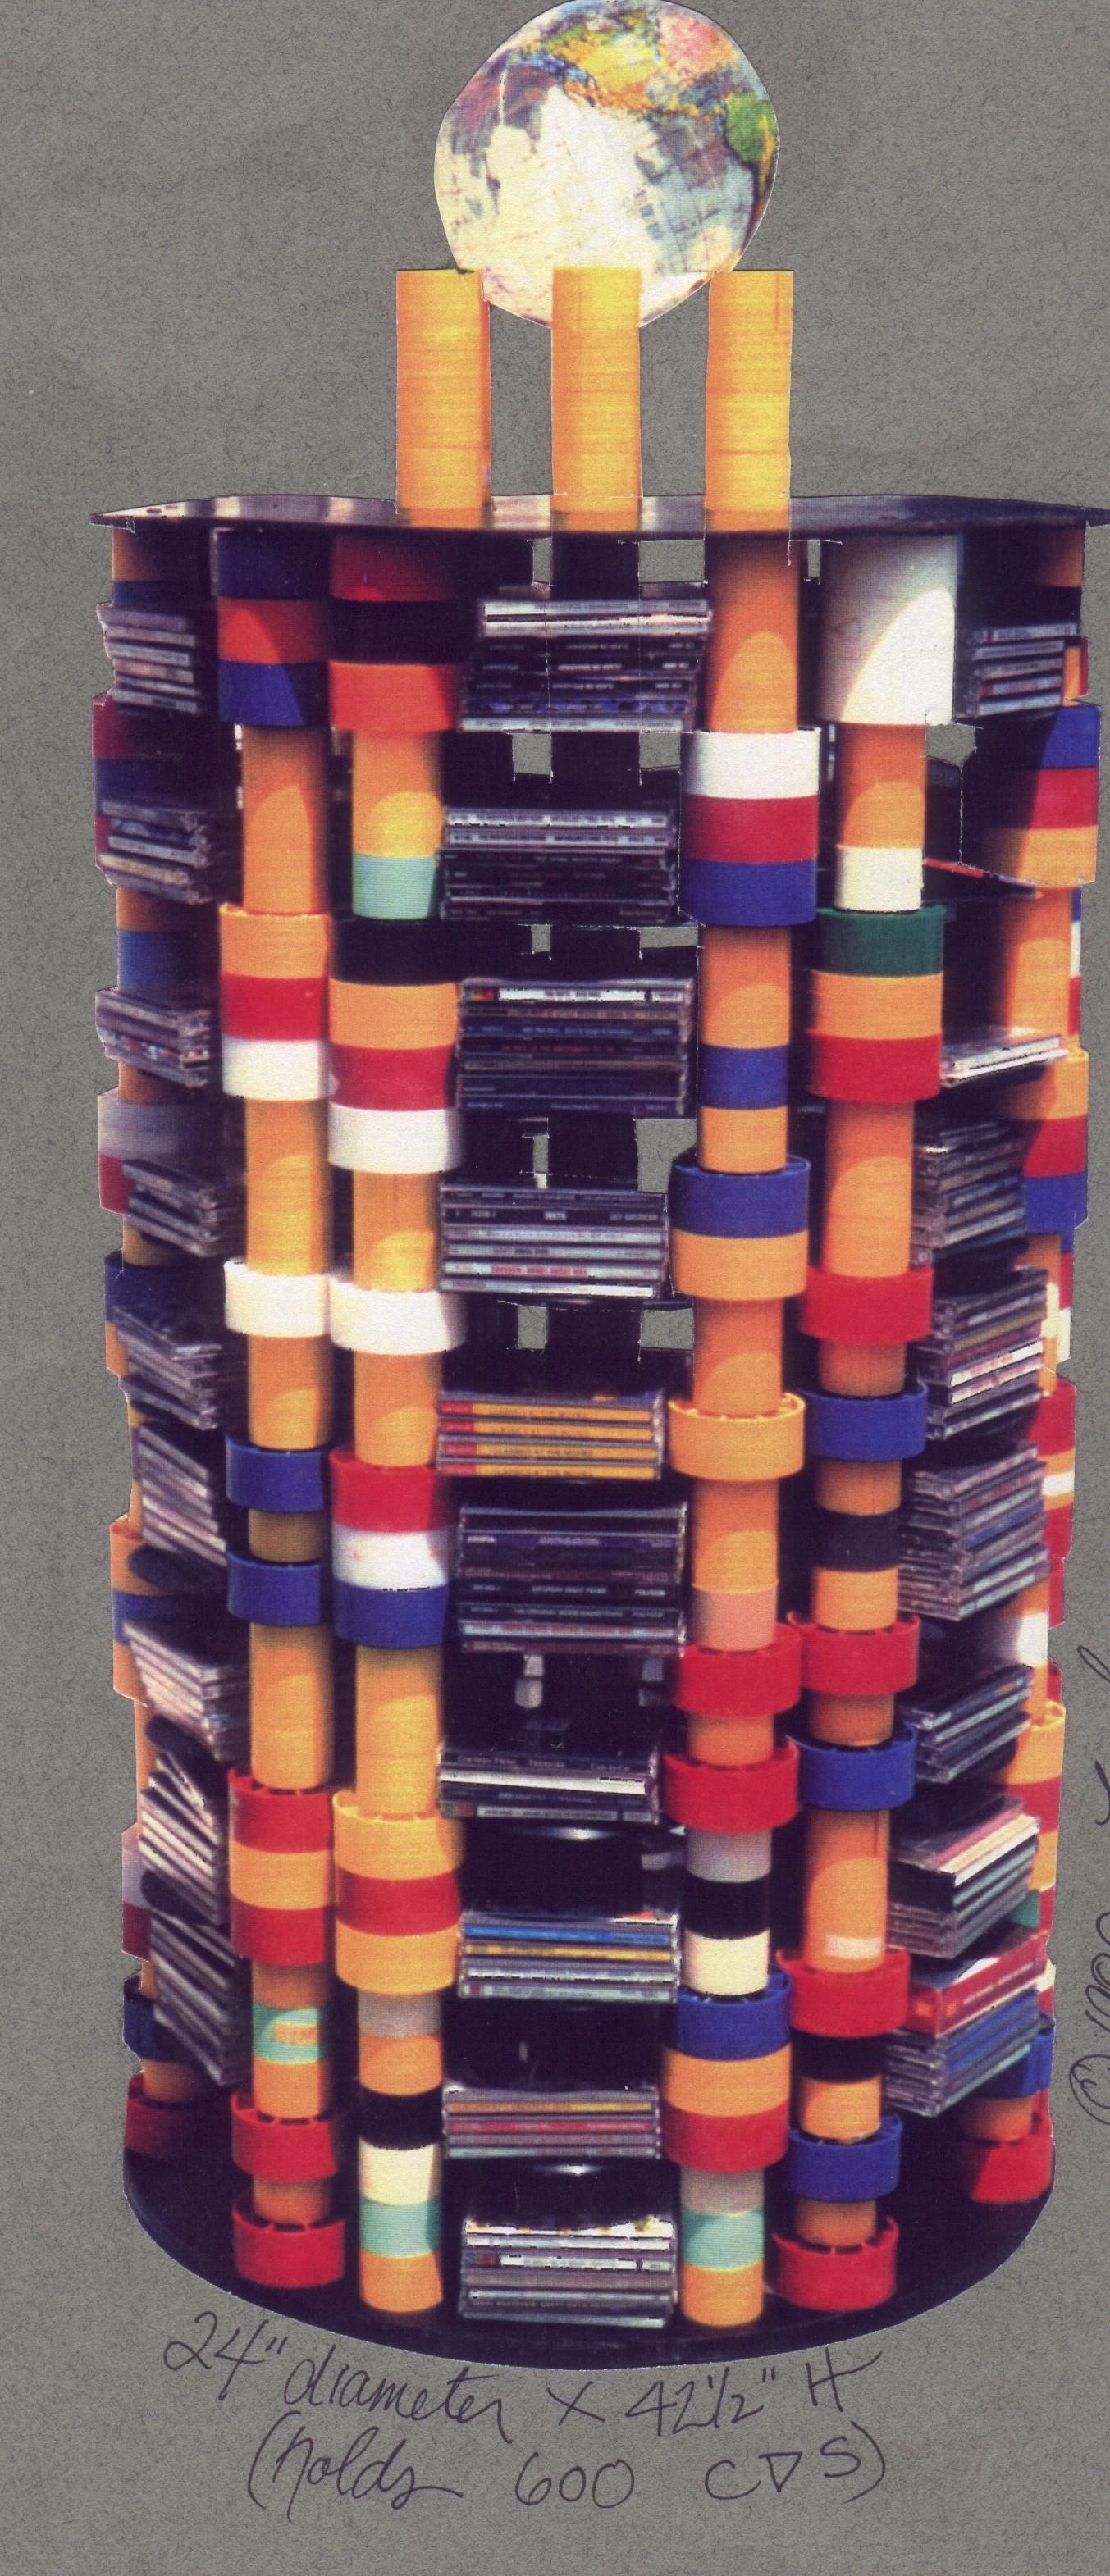 Film Core 45 RPM CD Stand